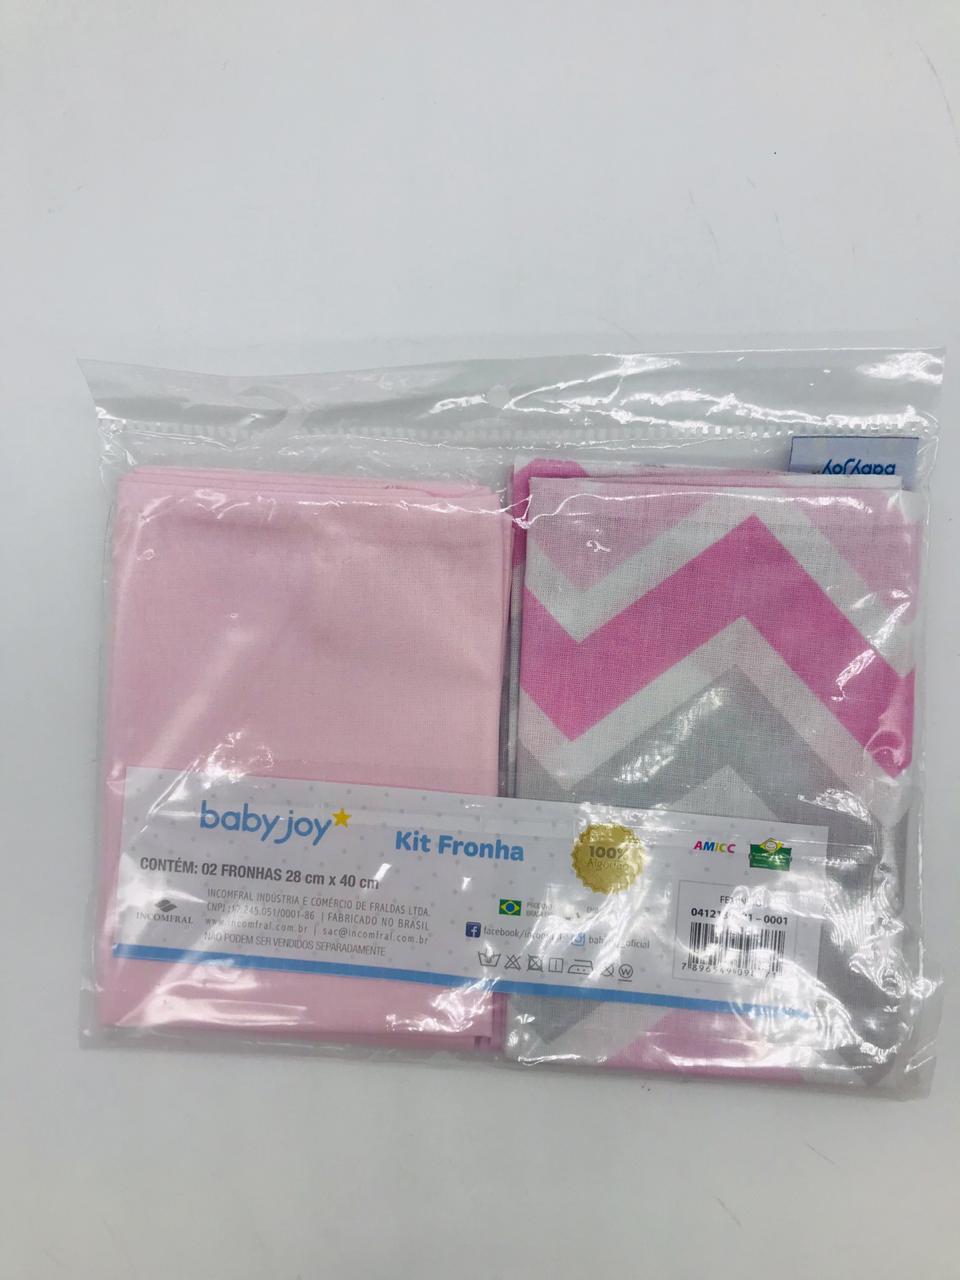 Kit Fronha 2 Und Chevron Rosa - Baby Joy Incomfral Ref 0412130001-0001